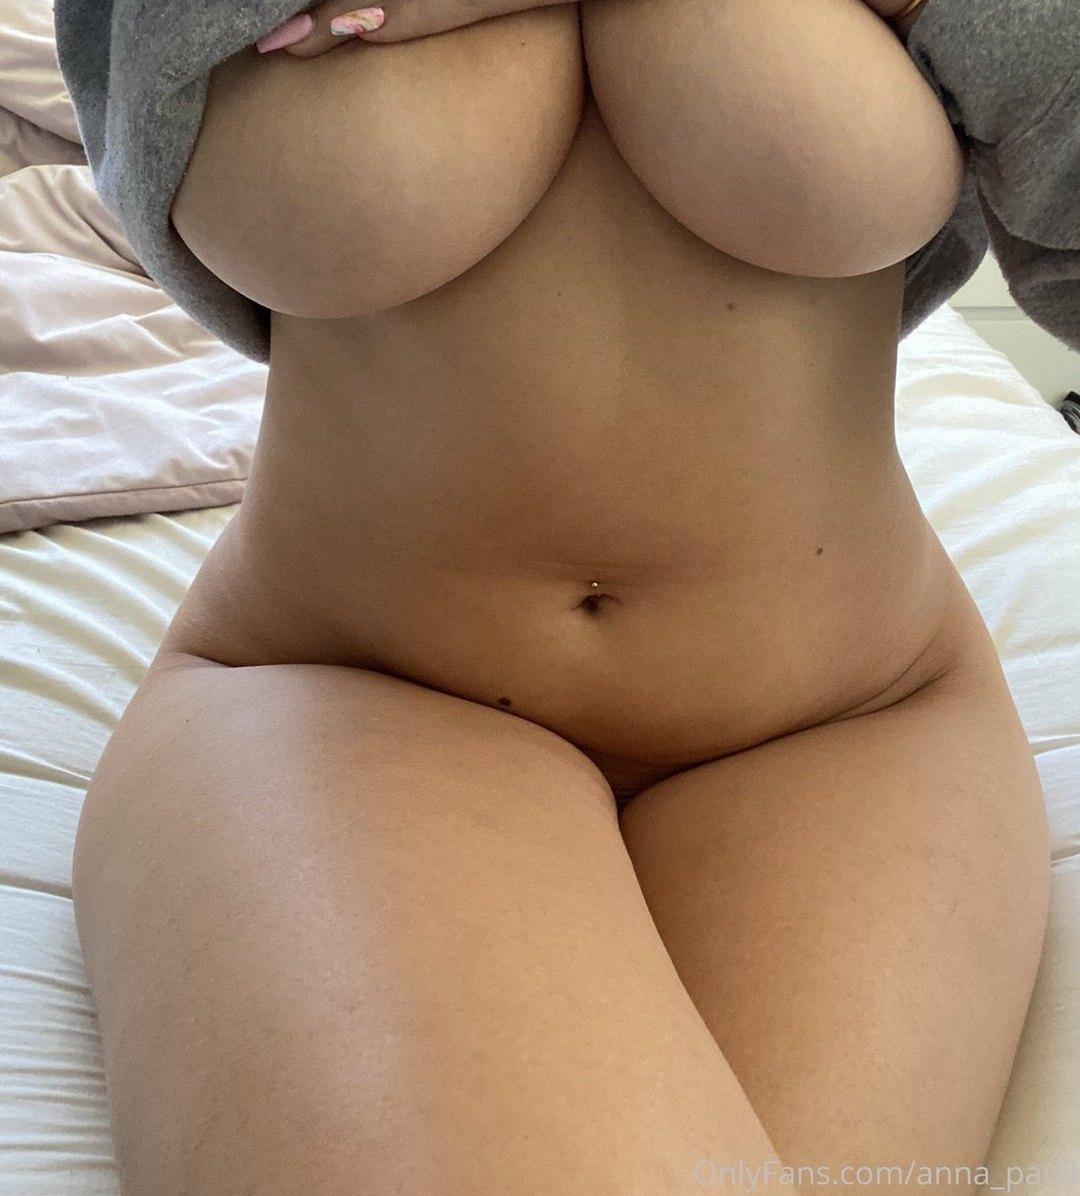 Anna Paul Anna Paull Onlyfans Nudes Leaks 0003